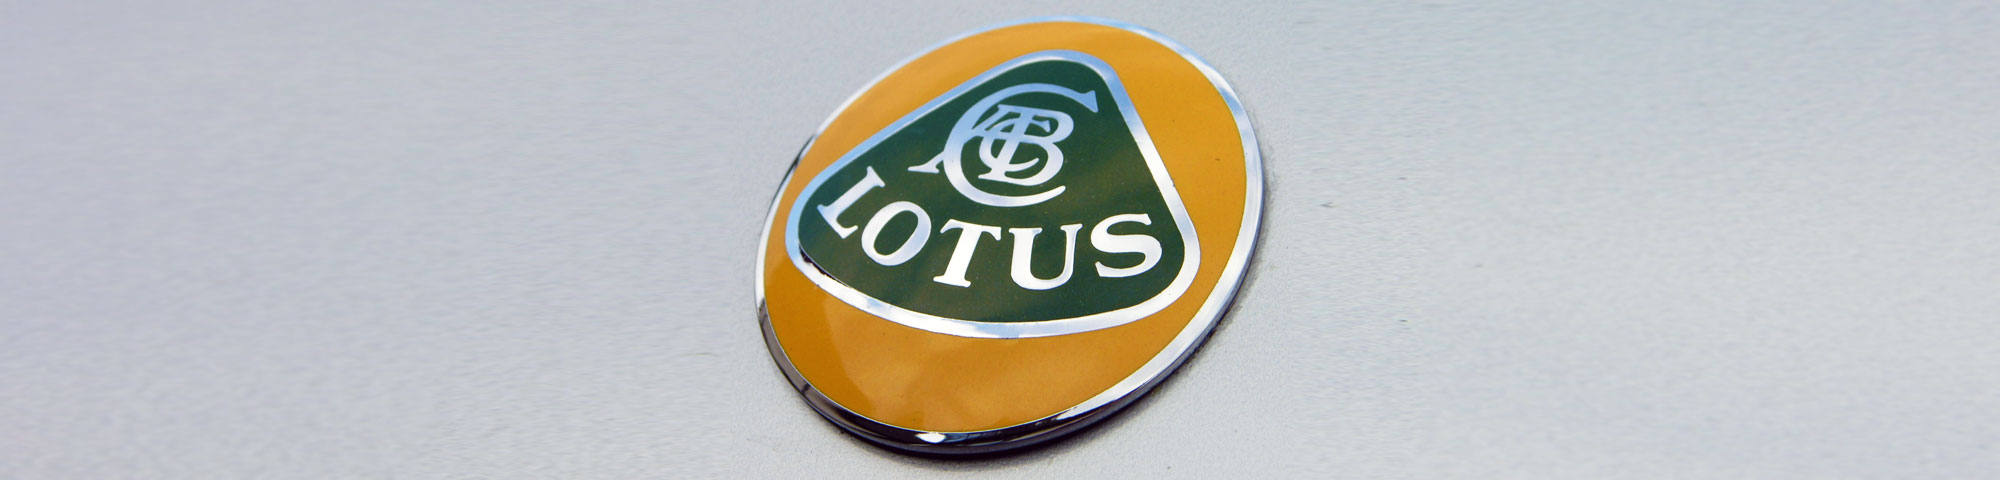 CLMS - Manufacturer - Lotus